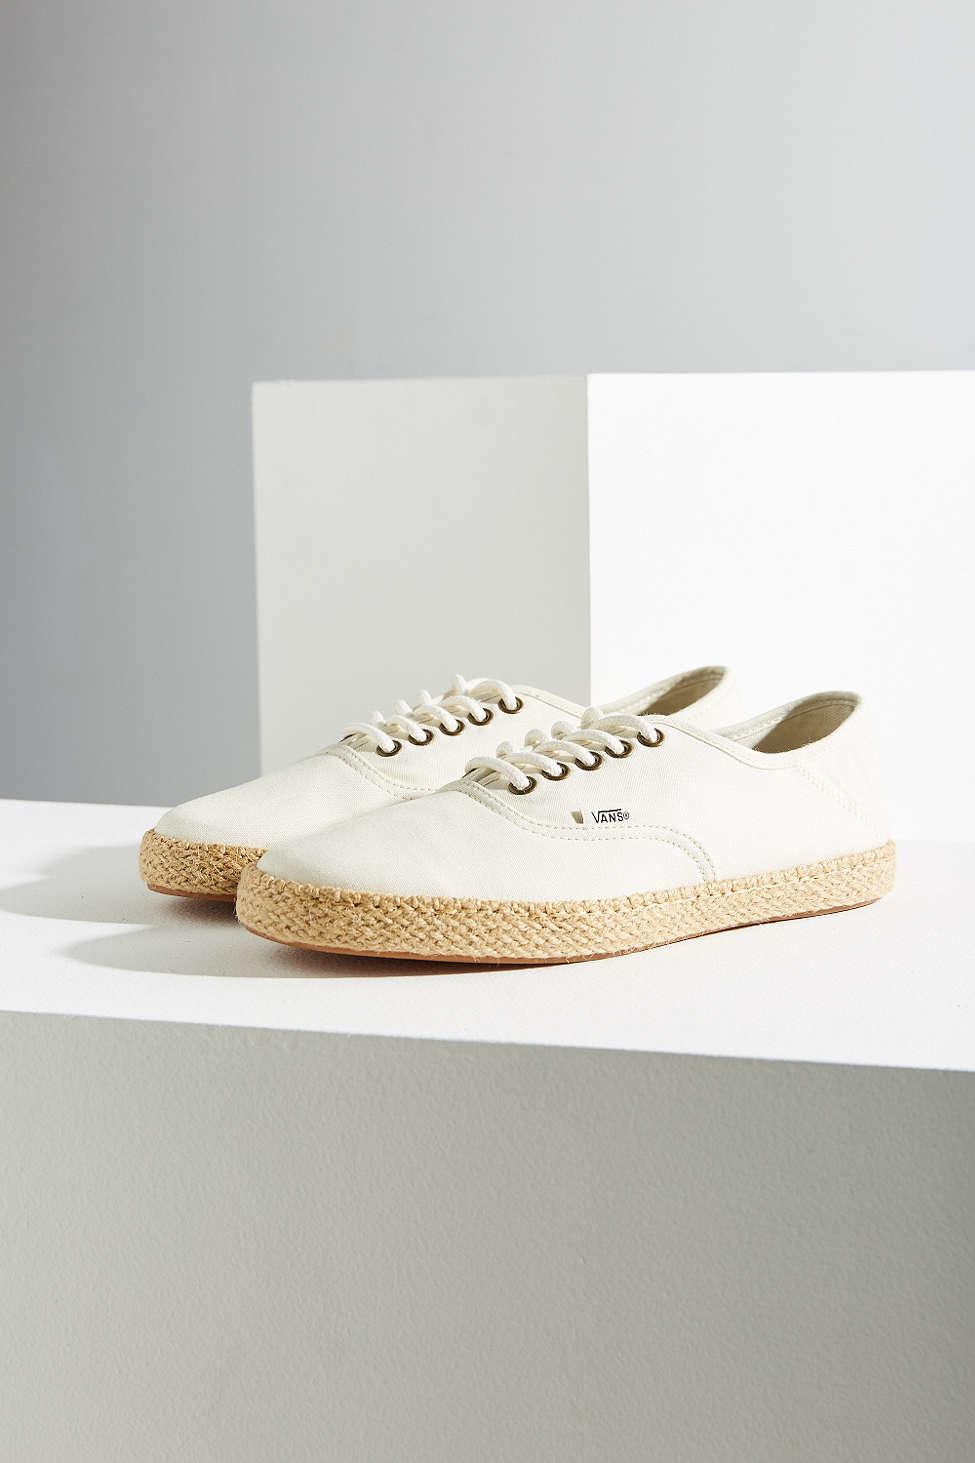 86ecaa62f0e Lyst - Vans Surf Authentic Espadrille Sneaker in White